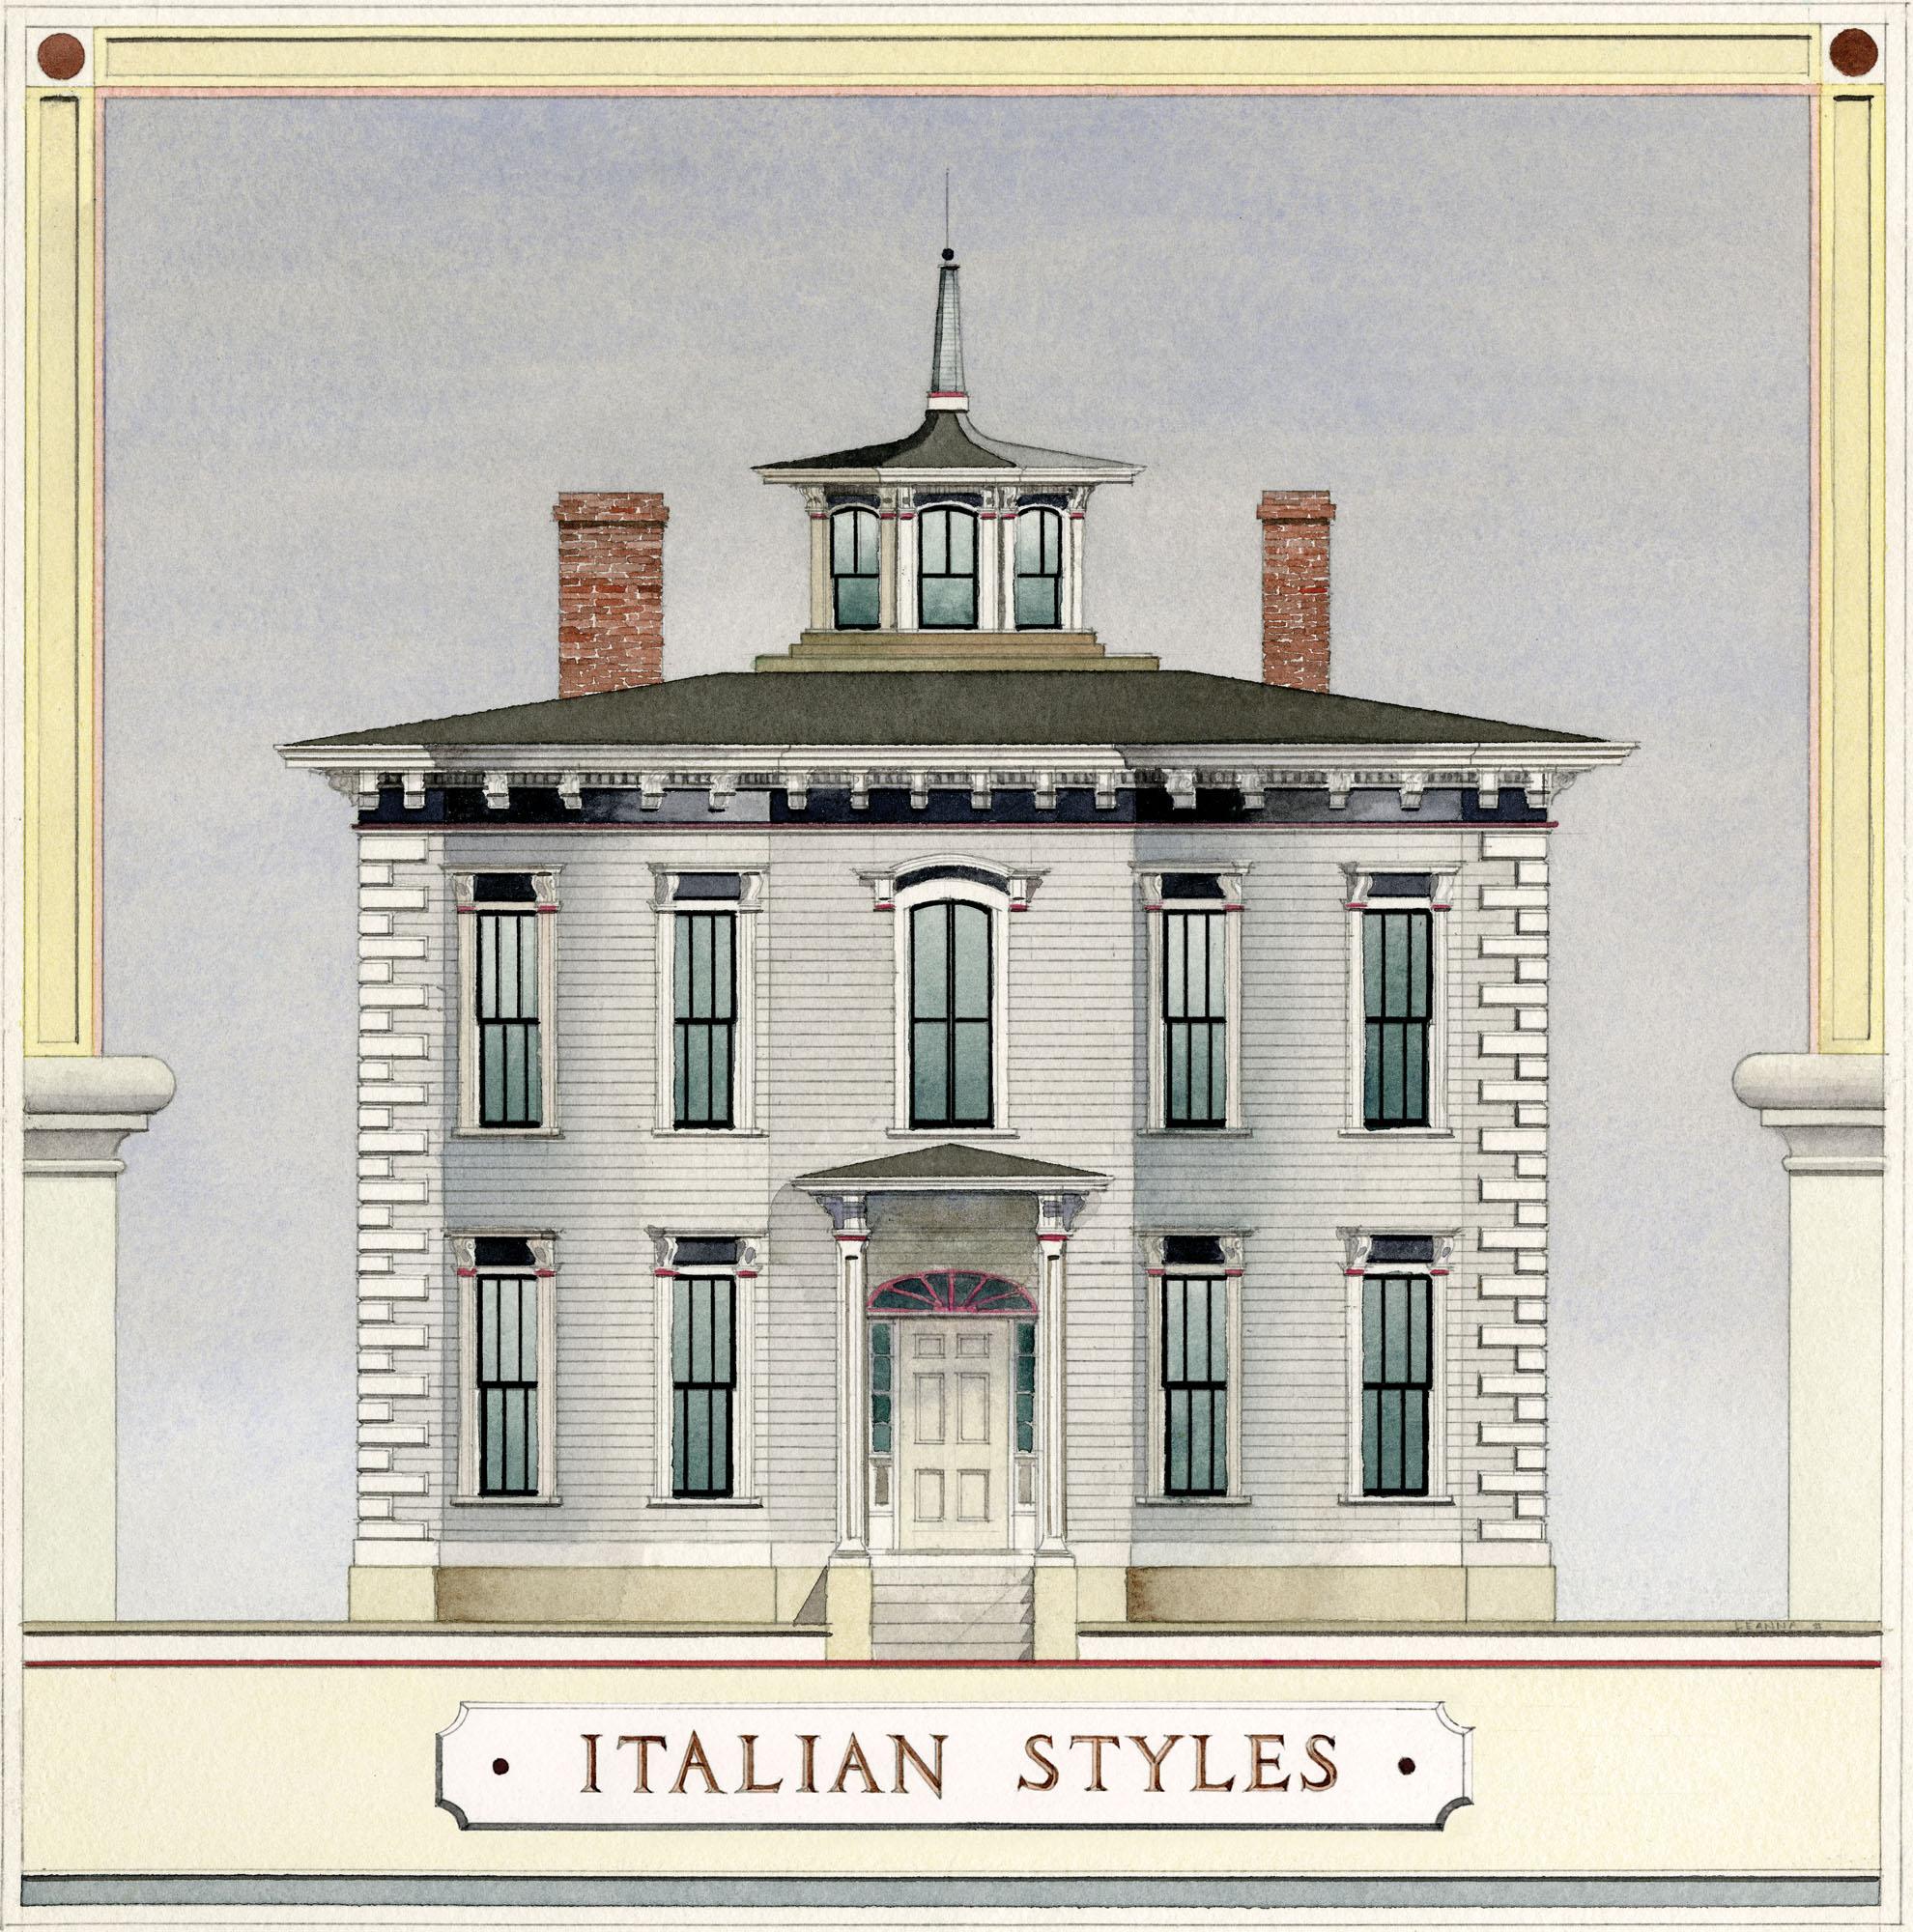 Italian House styles